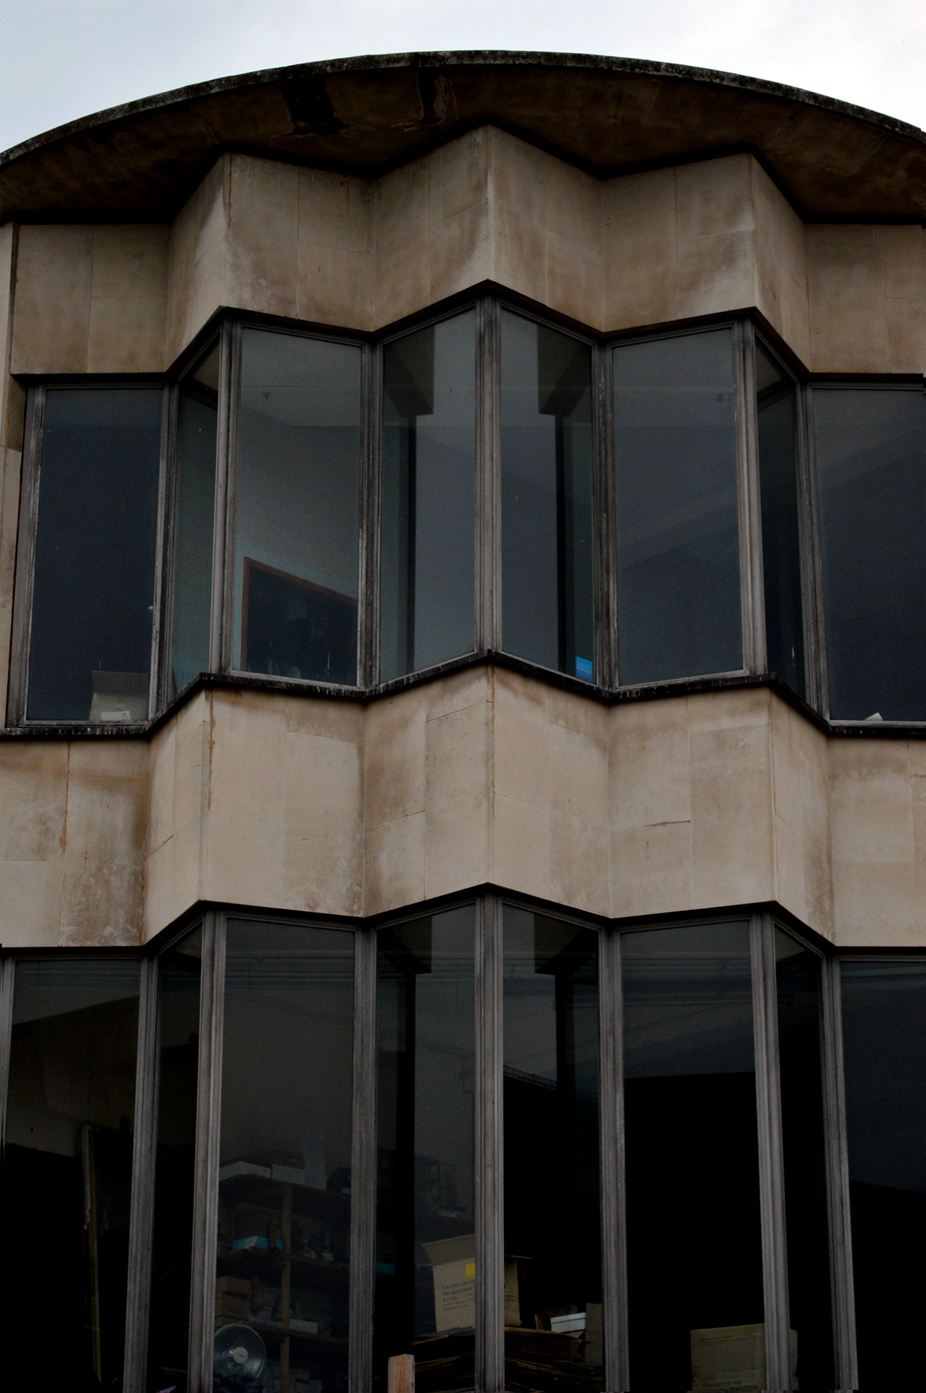 More windows.